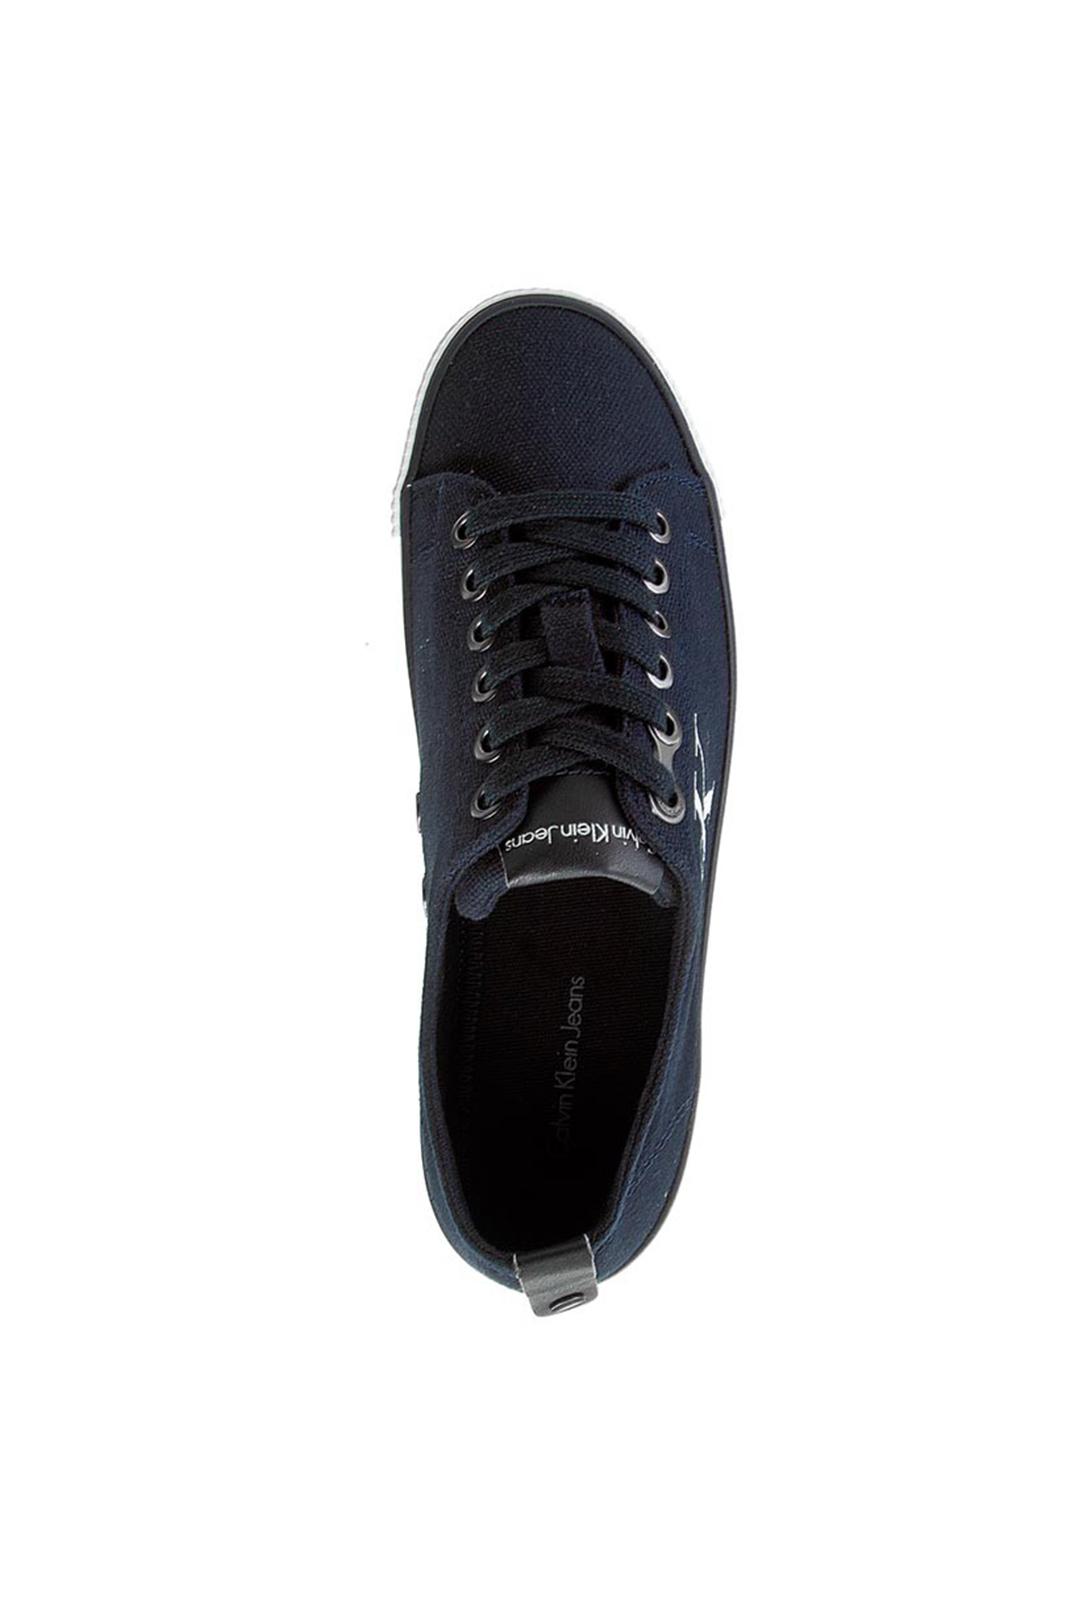 Baskets / Sneakers  Calvin klein DORA NAVY